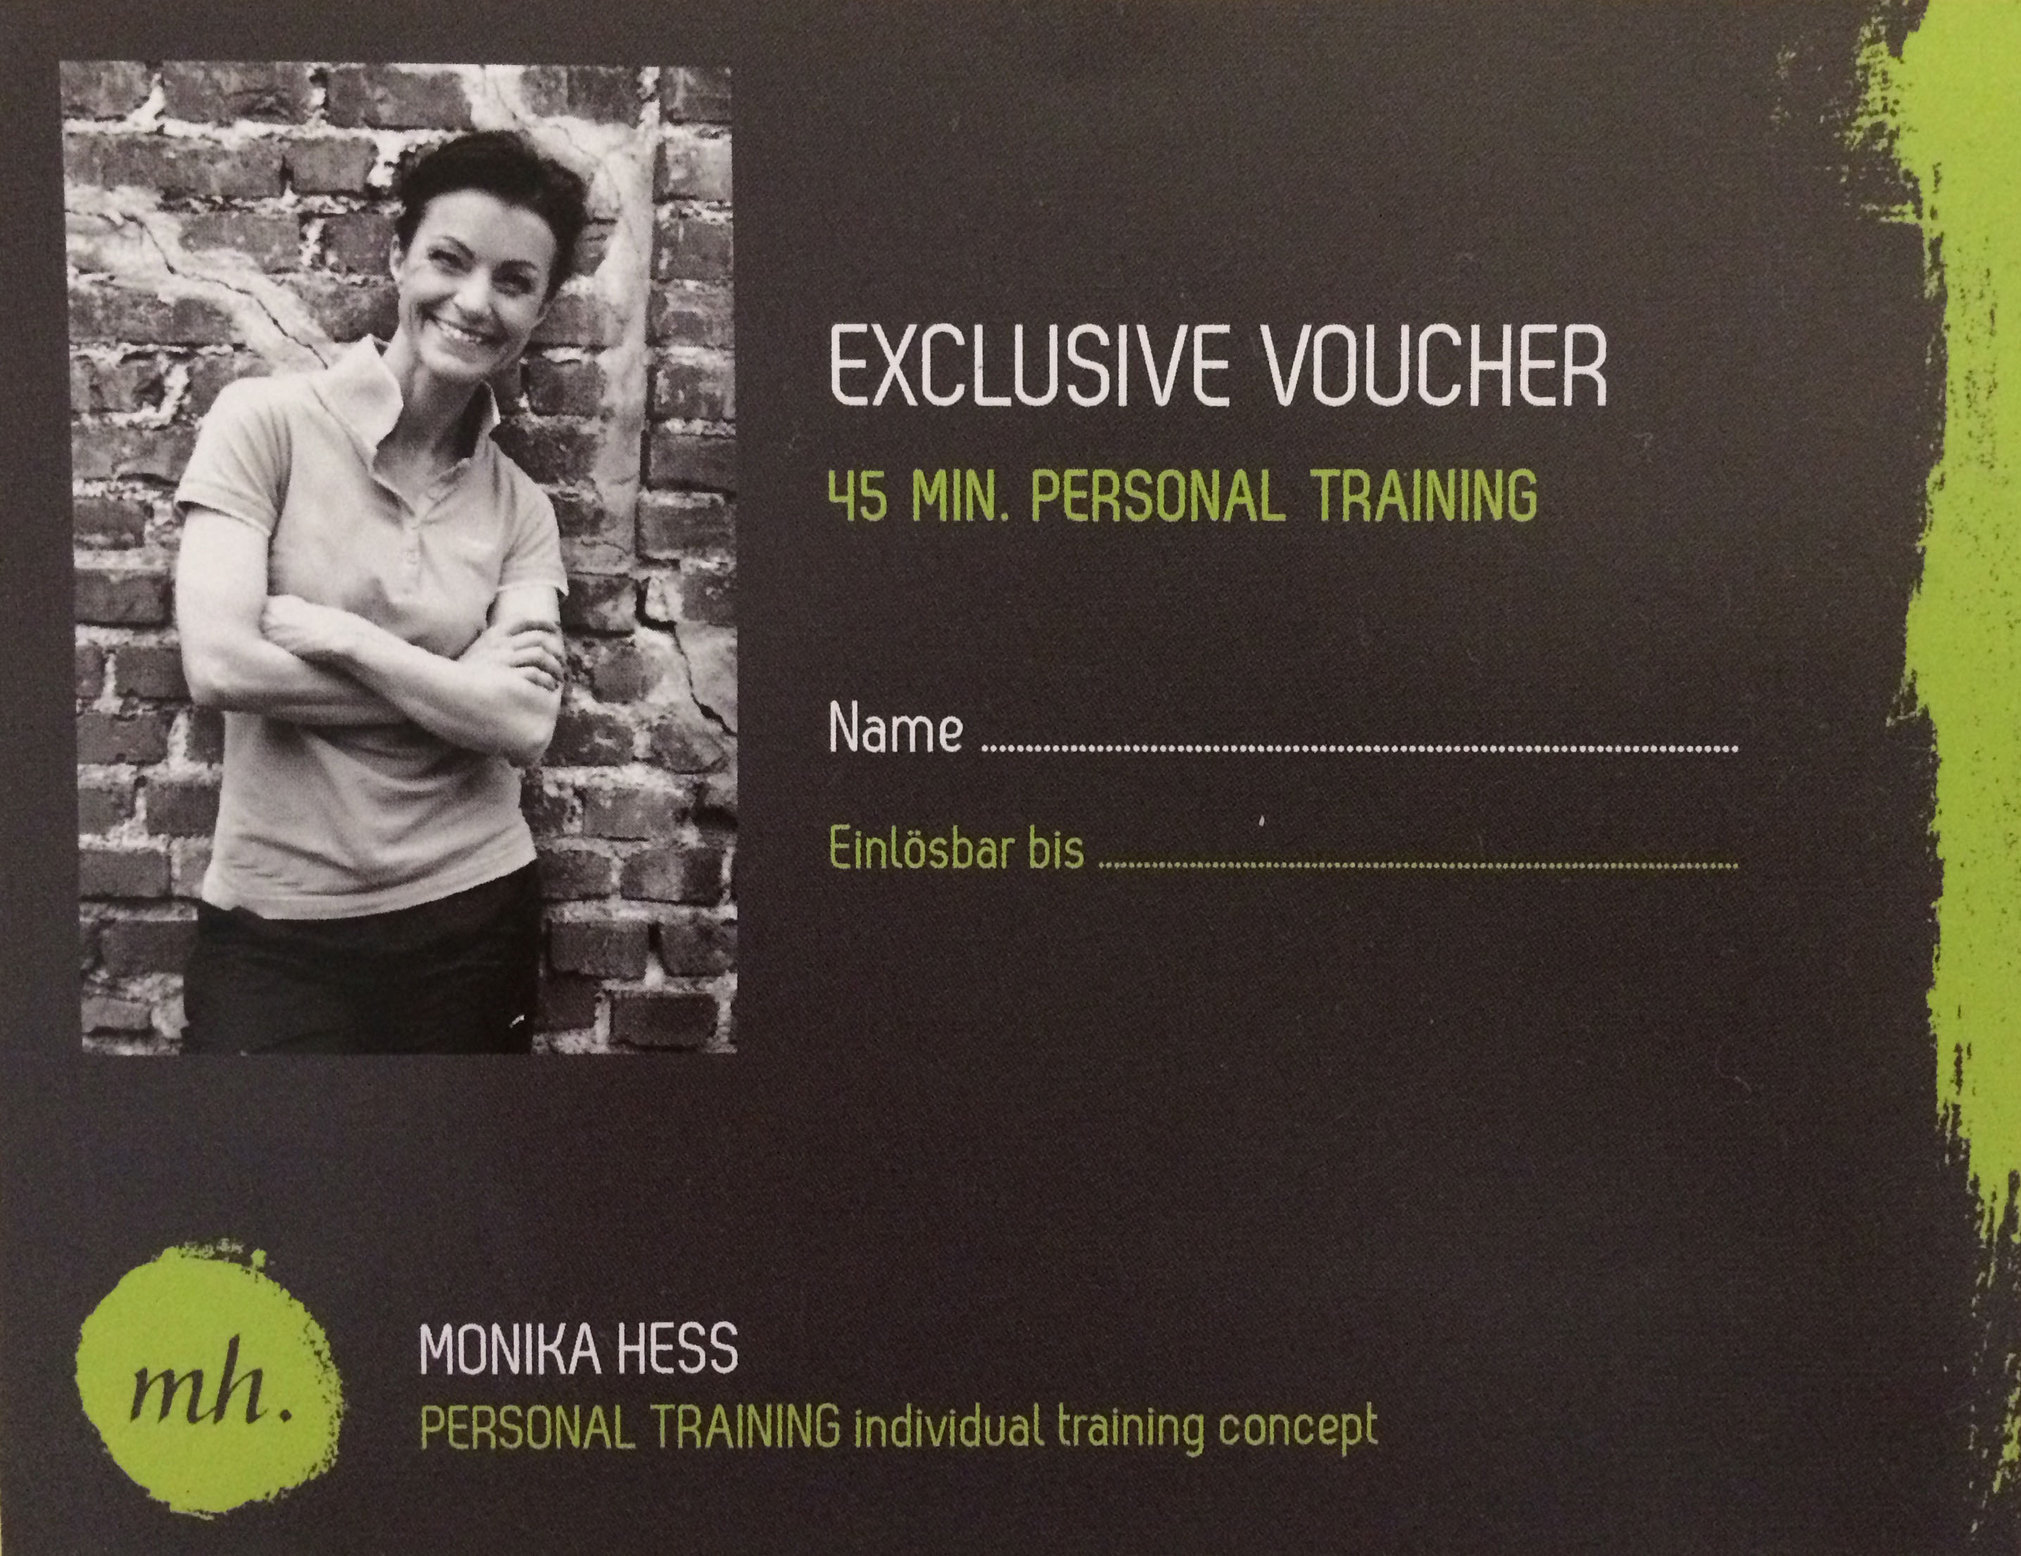 Monika Hess Personal Training